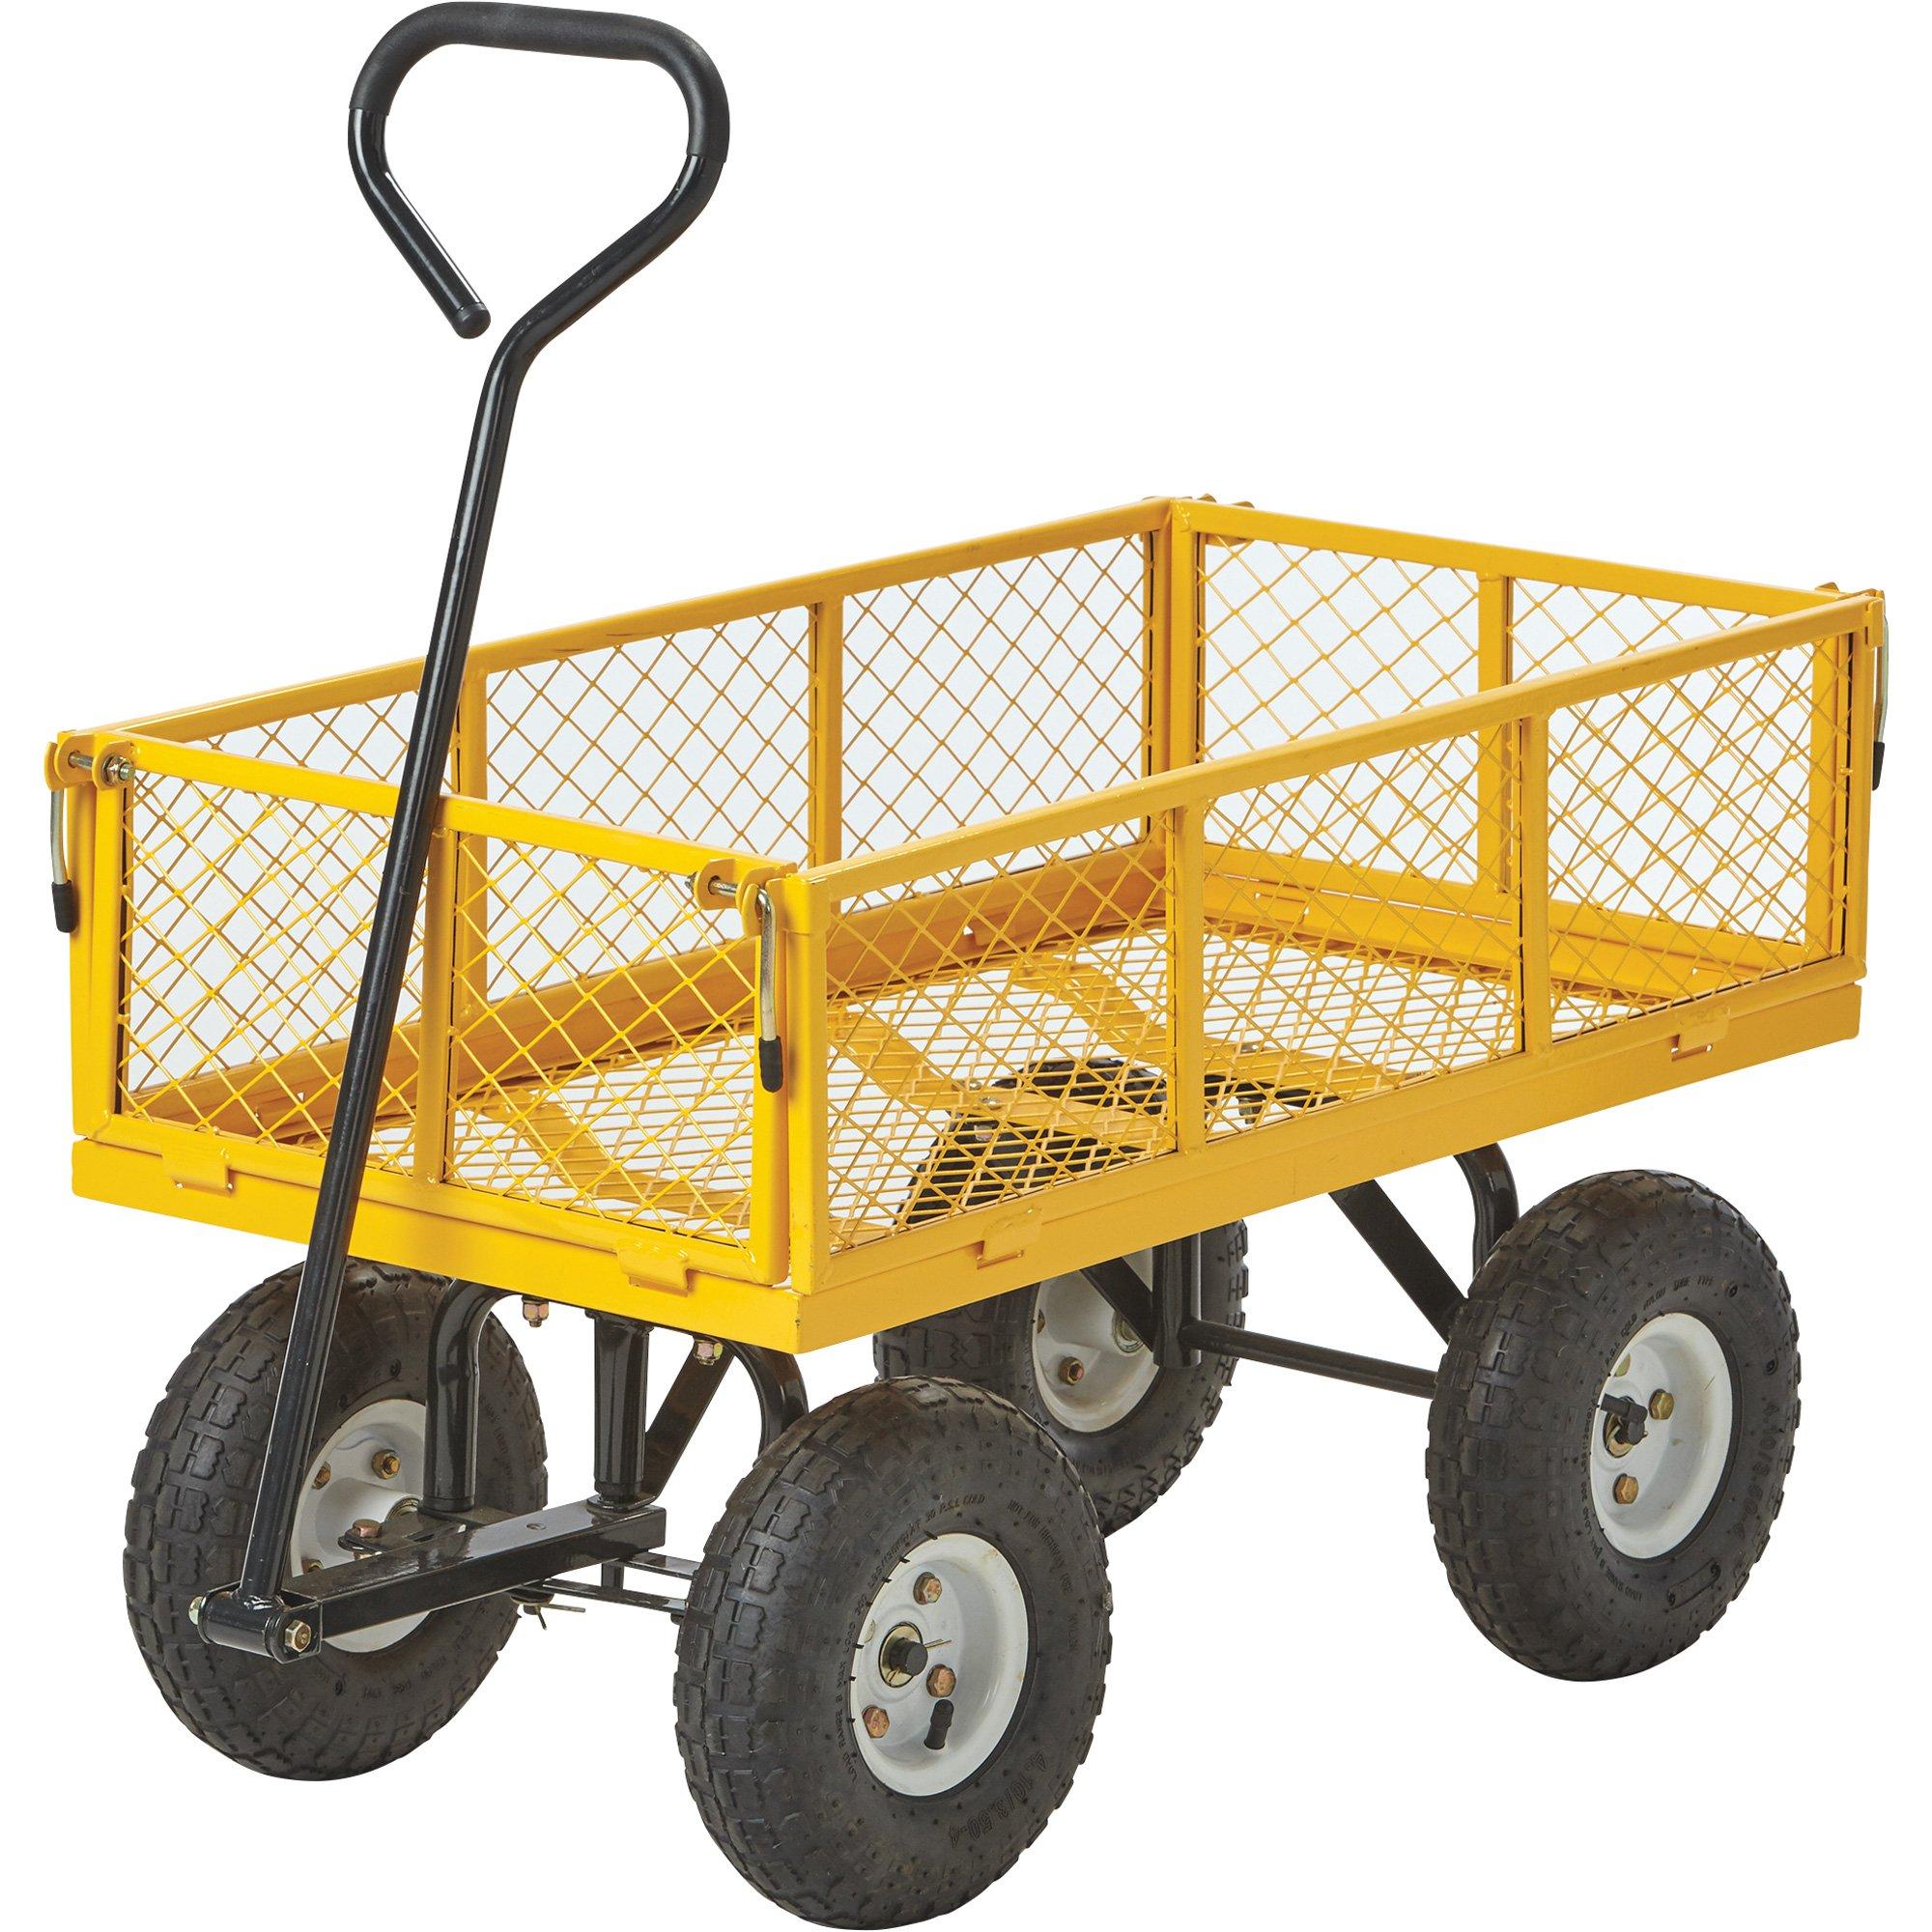 Kotulas 400-Lb. Capacity Steel Garden Wagon